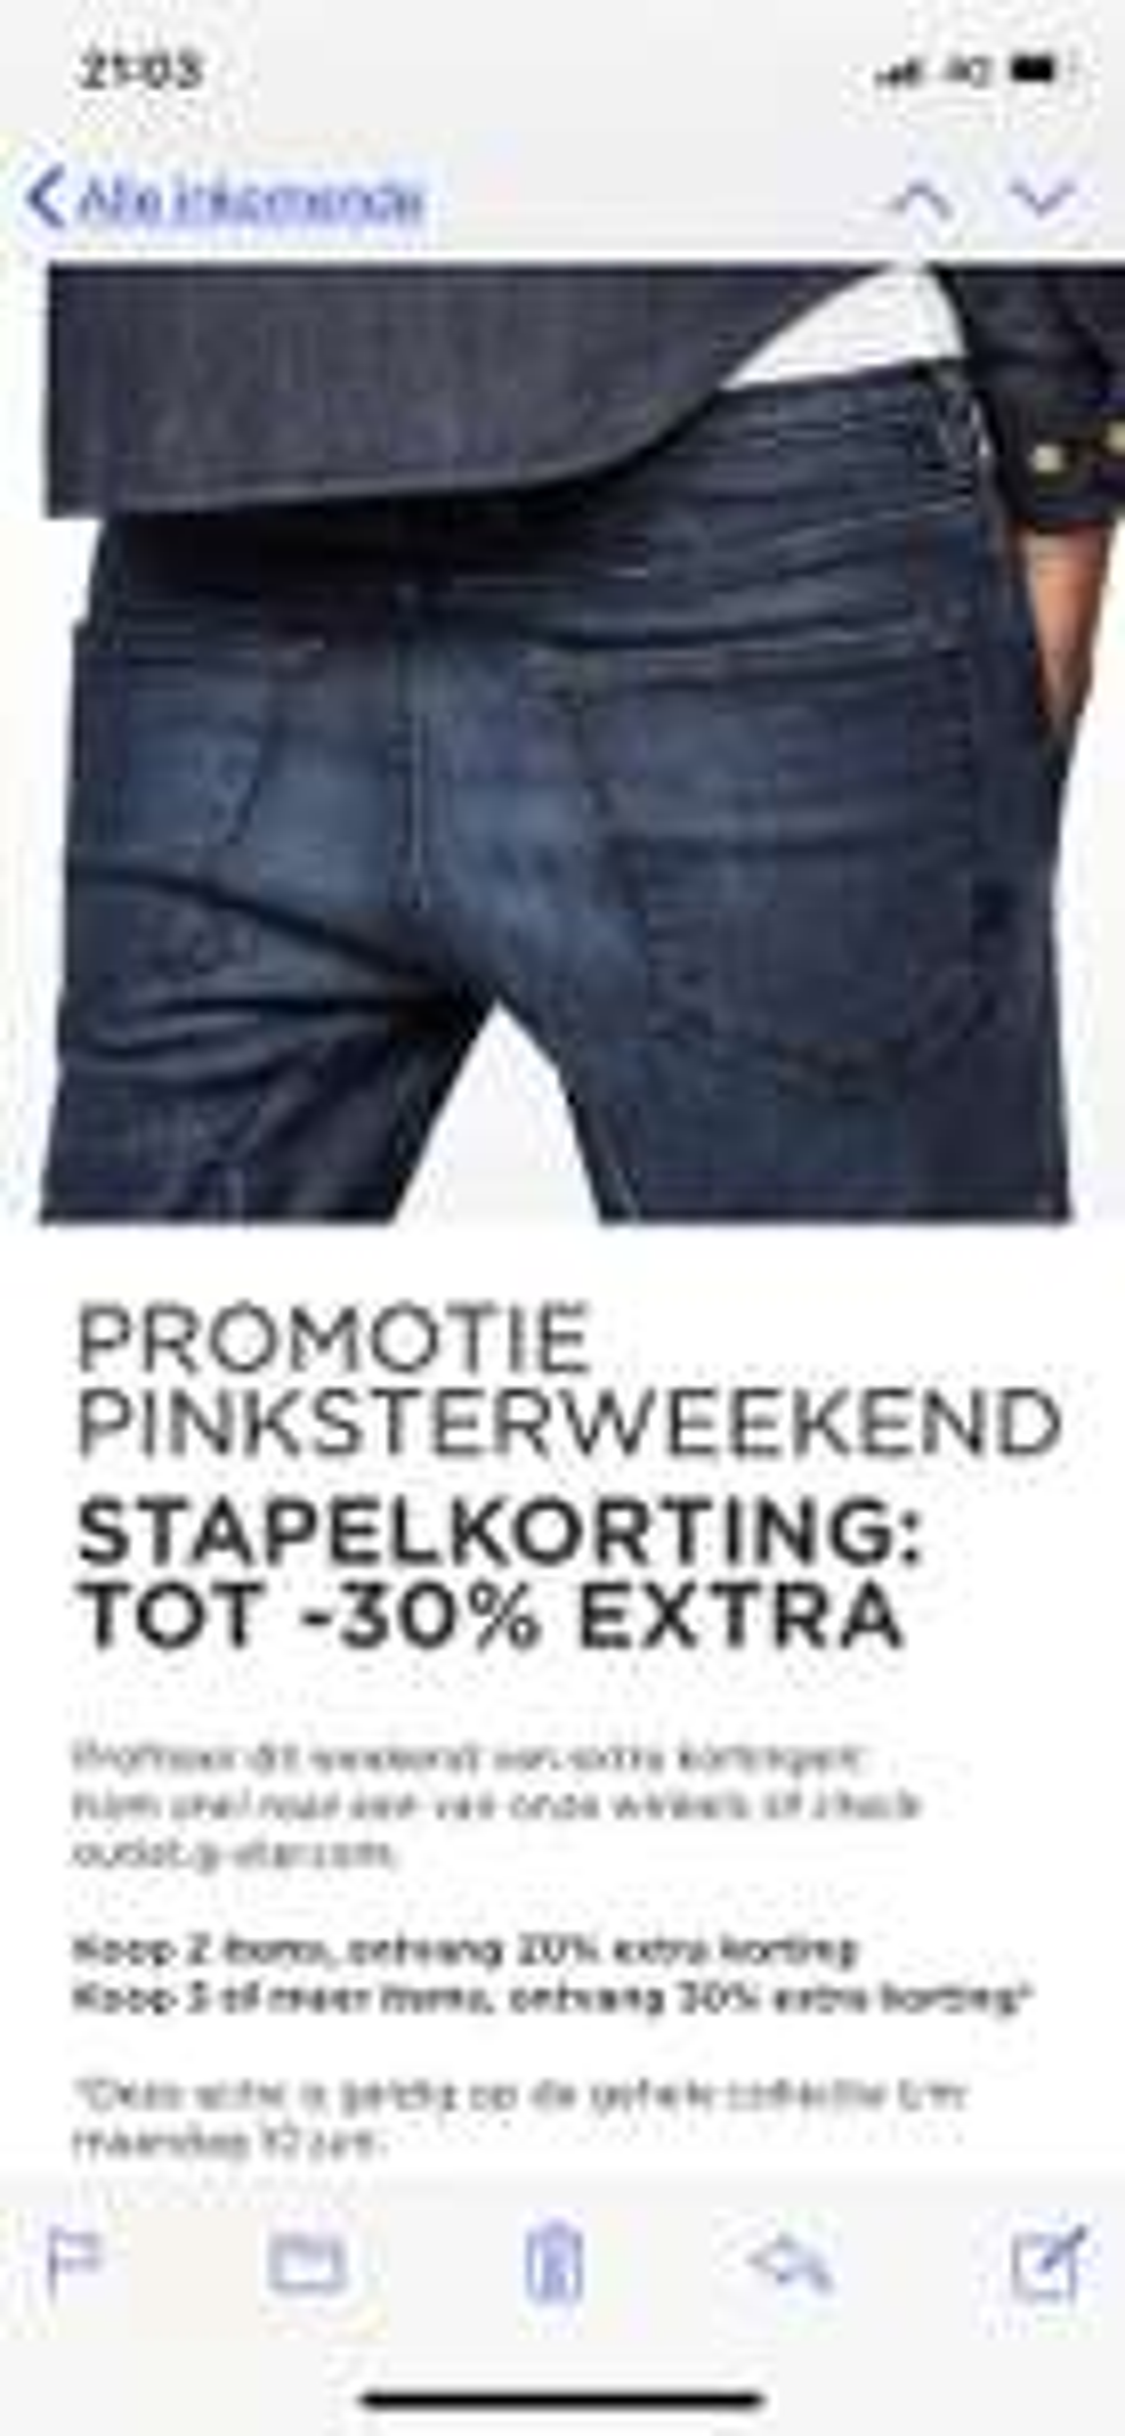 Promotie Pinksterweekend